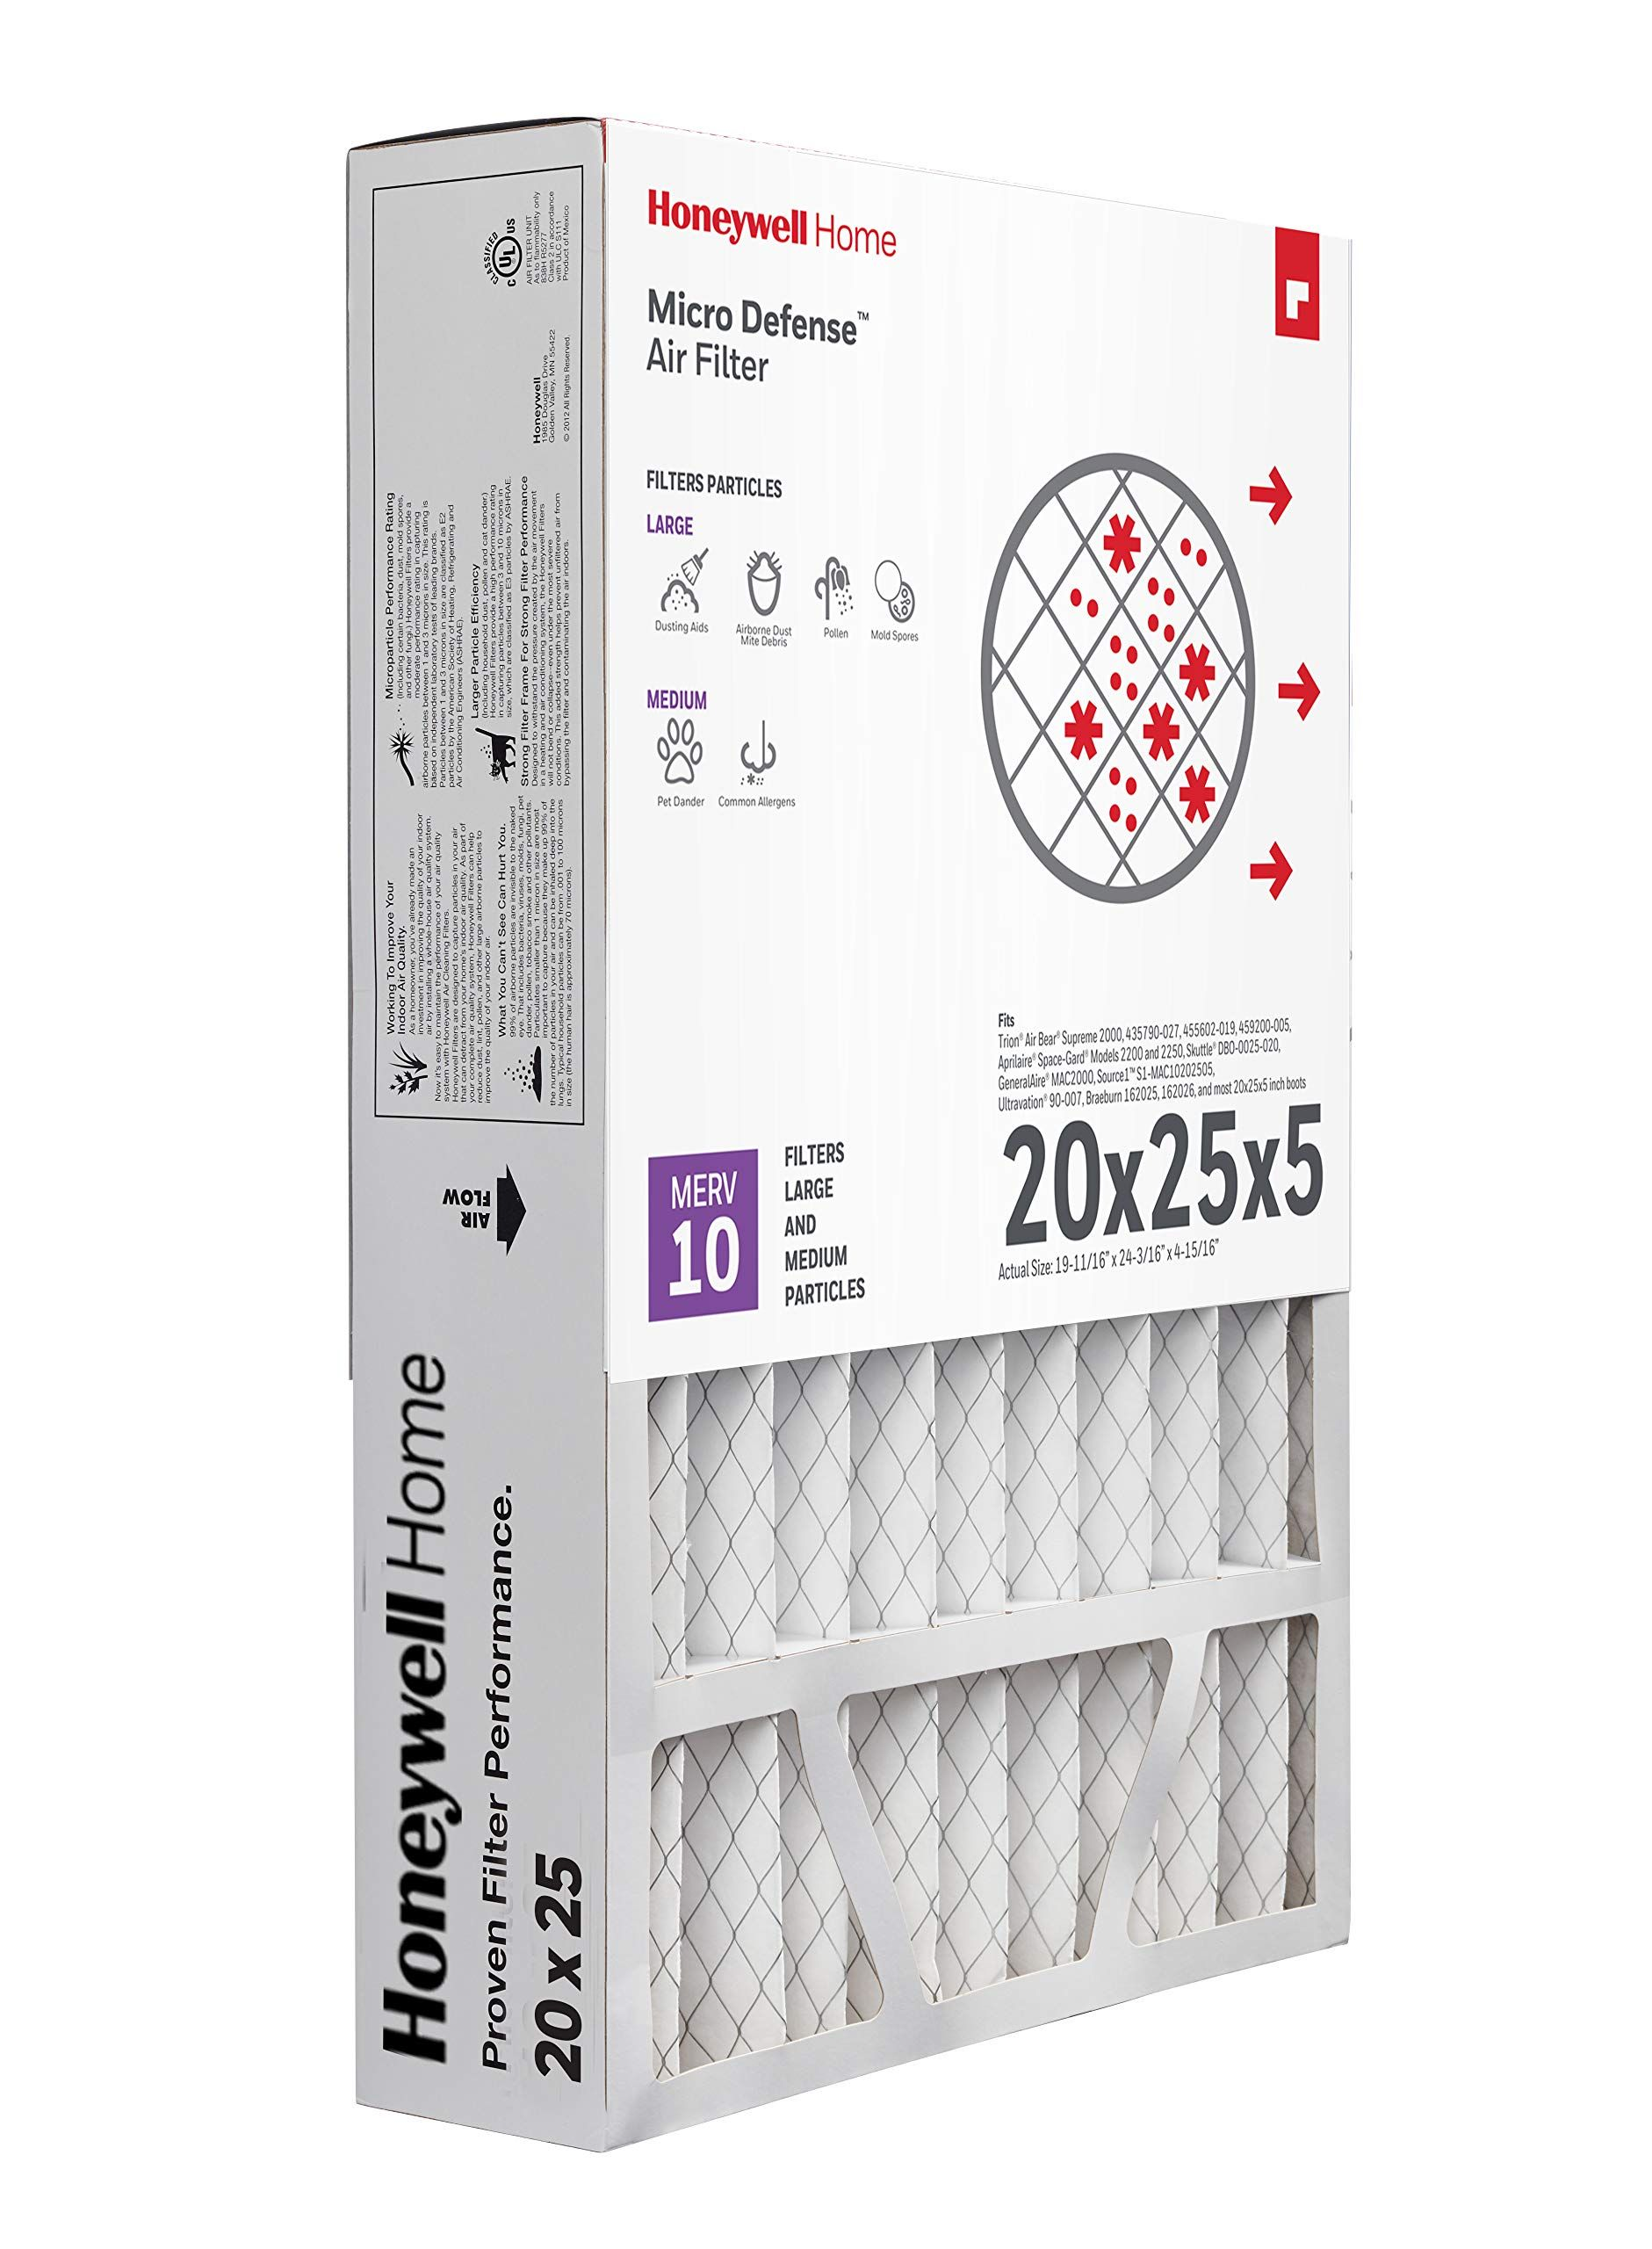 Microdefense By Honeywell Cf508a2025 Honeywell Home Microdefense Ac Furnace Air Filter 20x25x5 Merv 10 1pk Find Air Filter Ac Furnace Air Filter Lights